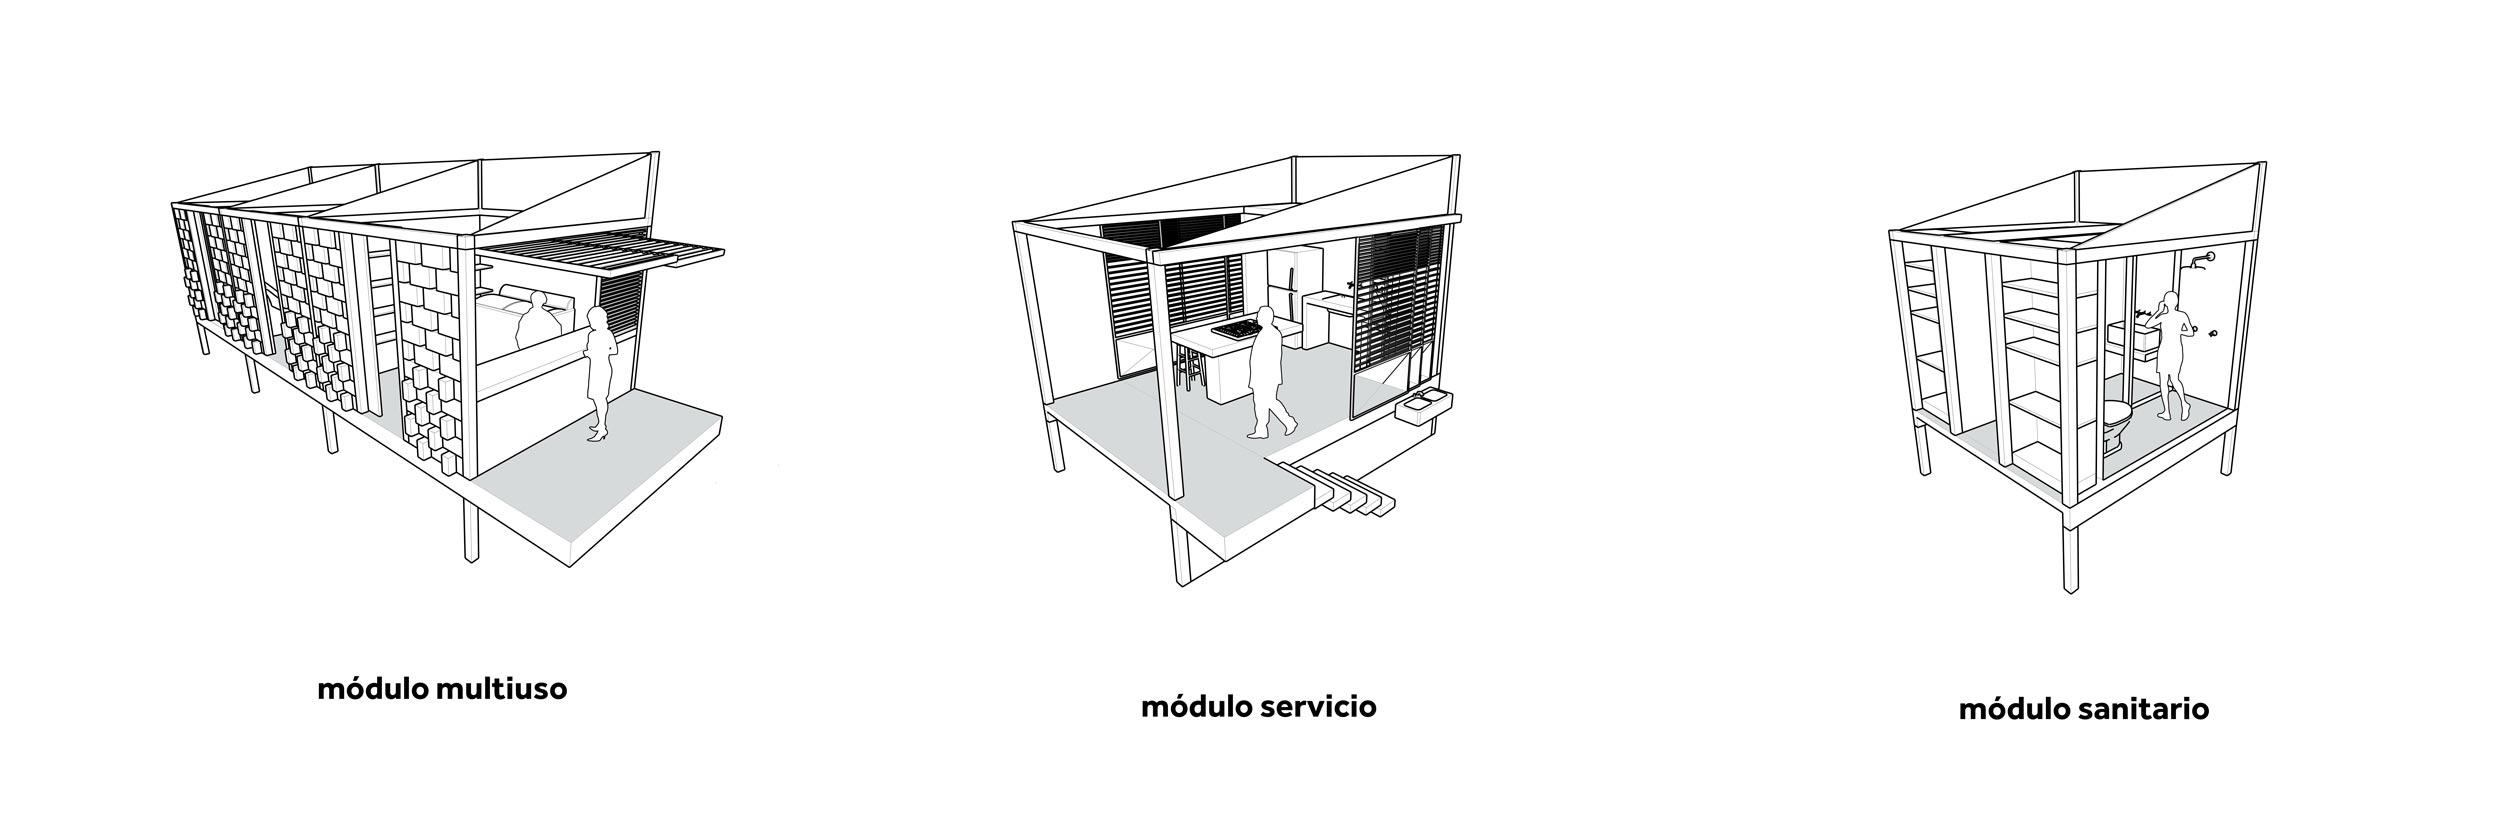 vivienda-de-emergencia-5